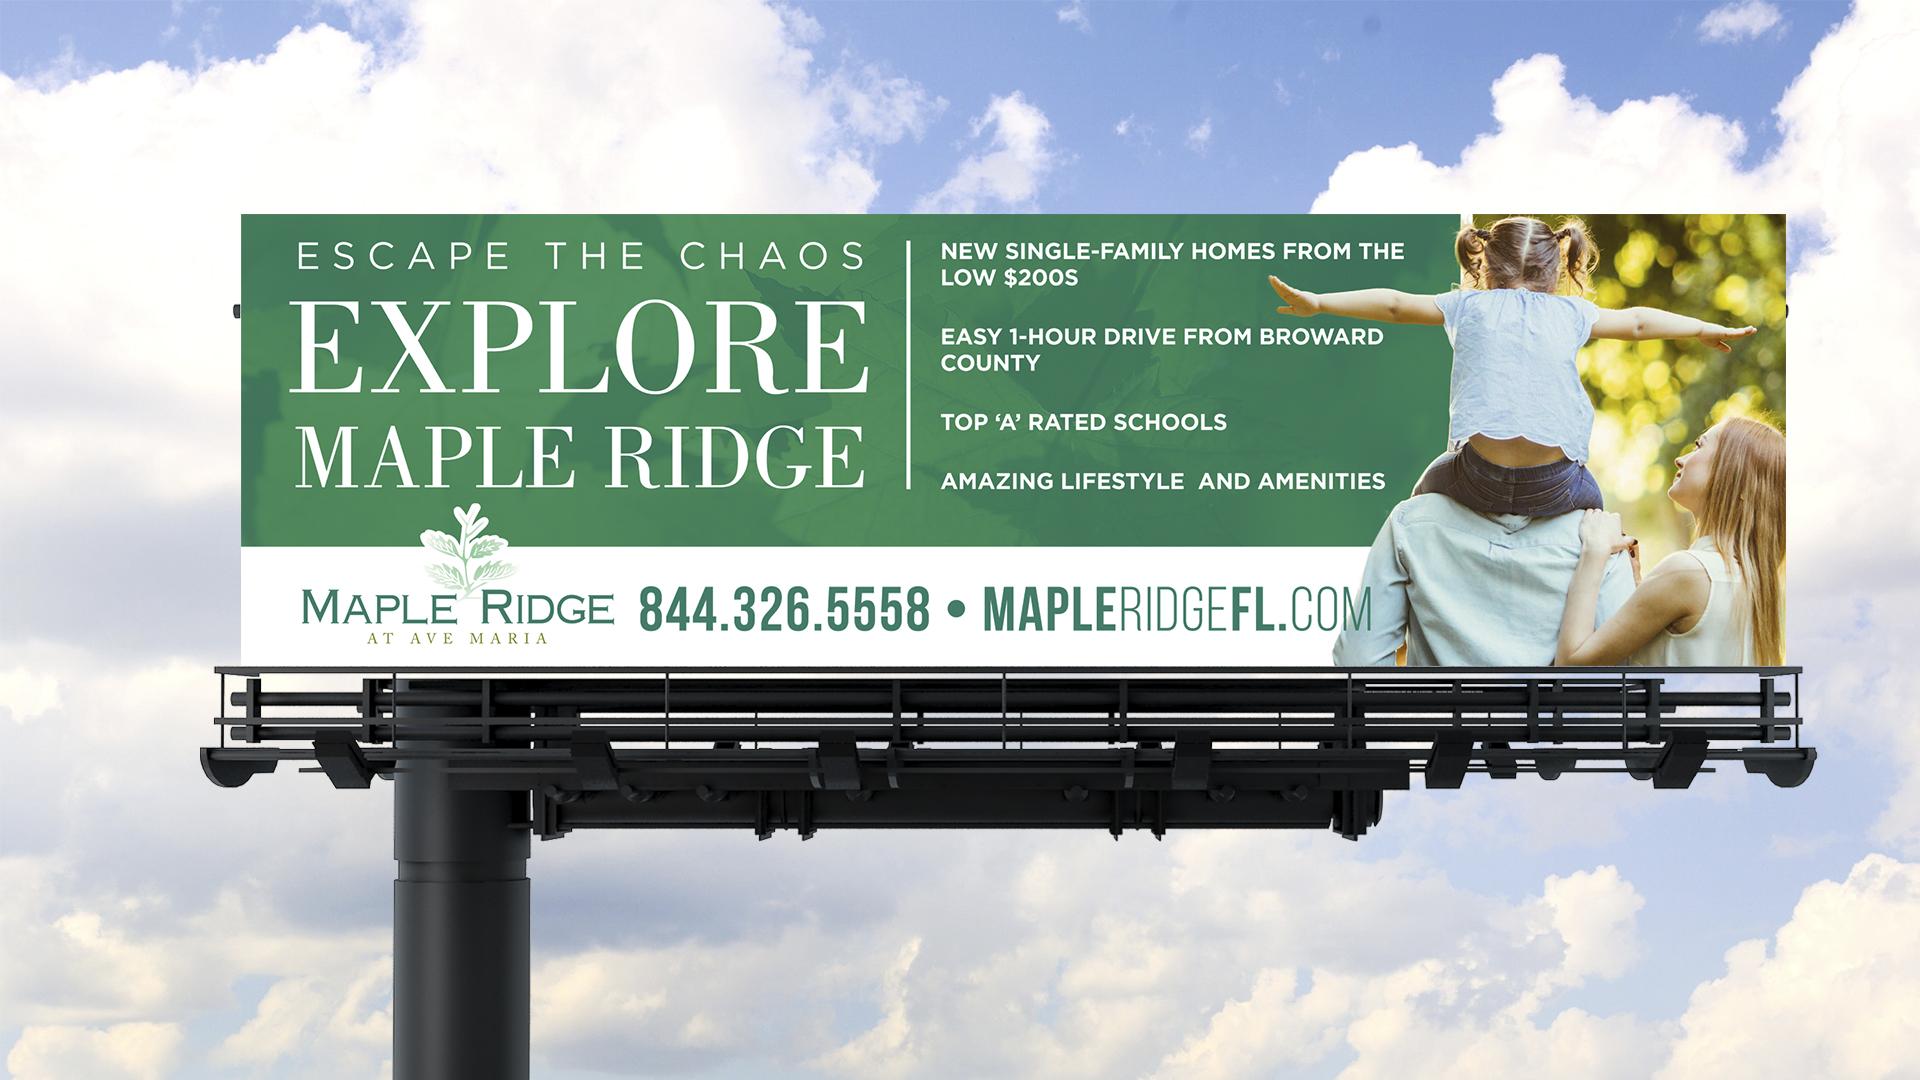 Maple Ridge Downtown Doral Billboard